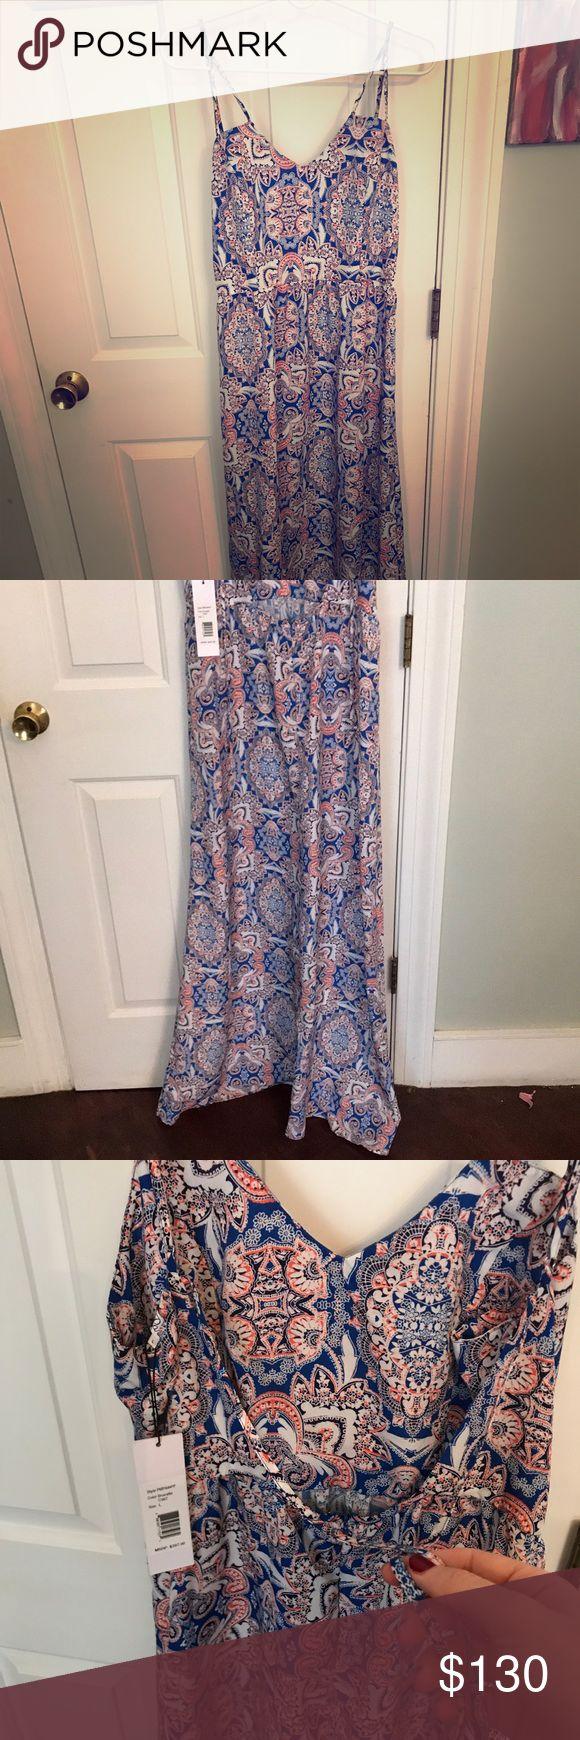 Parker patterned Maxi Dress never worn A beautiful silky maxi dress by Parker NY, never worn. Size large, slightly long. Parker Dresses Maxi